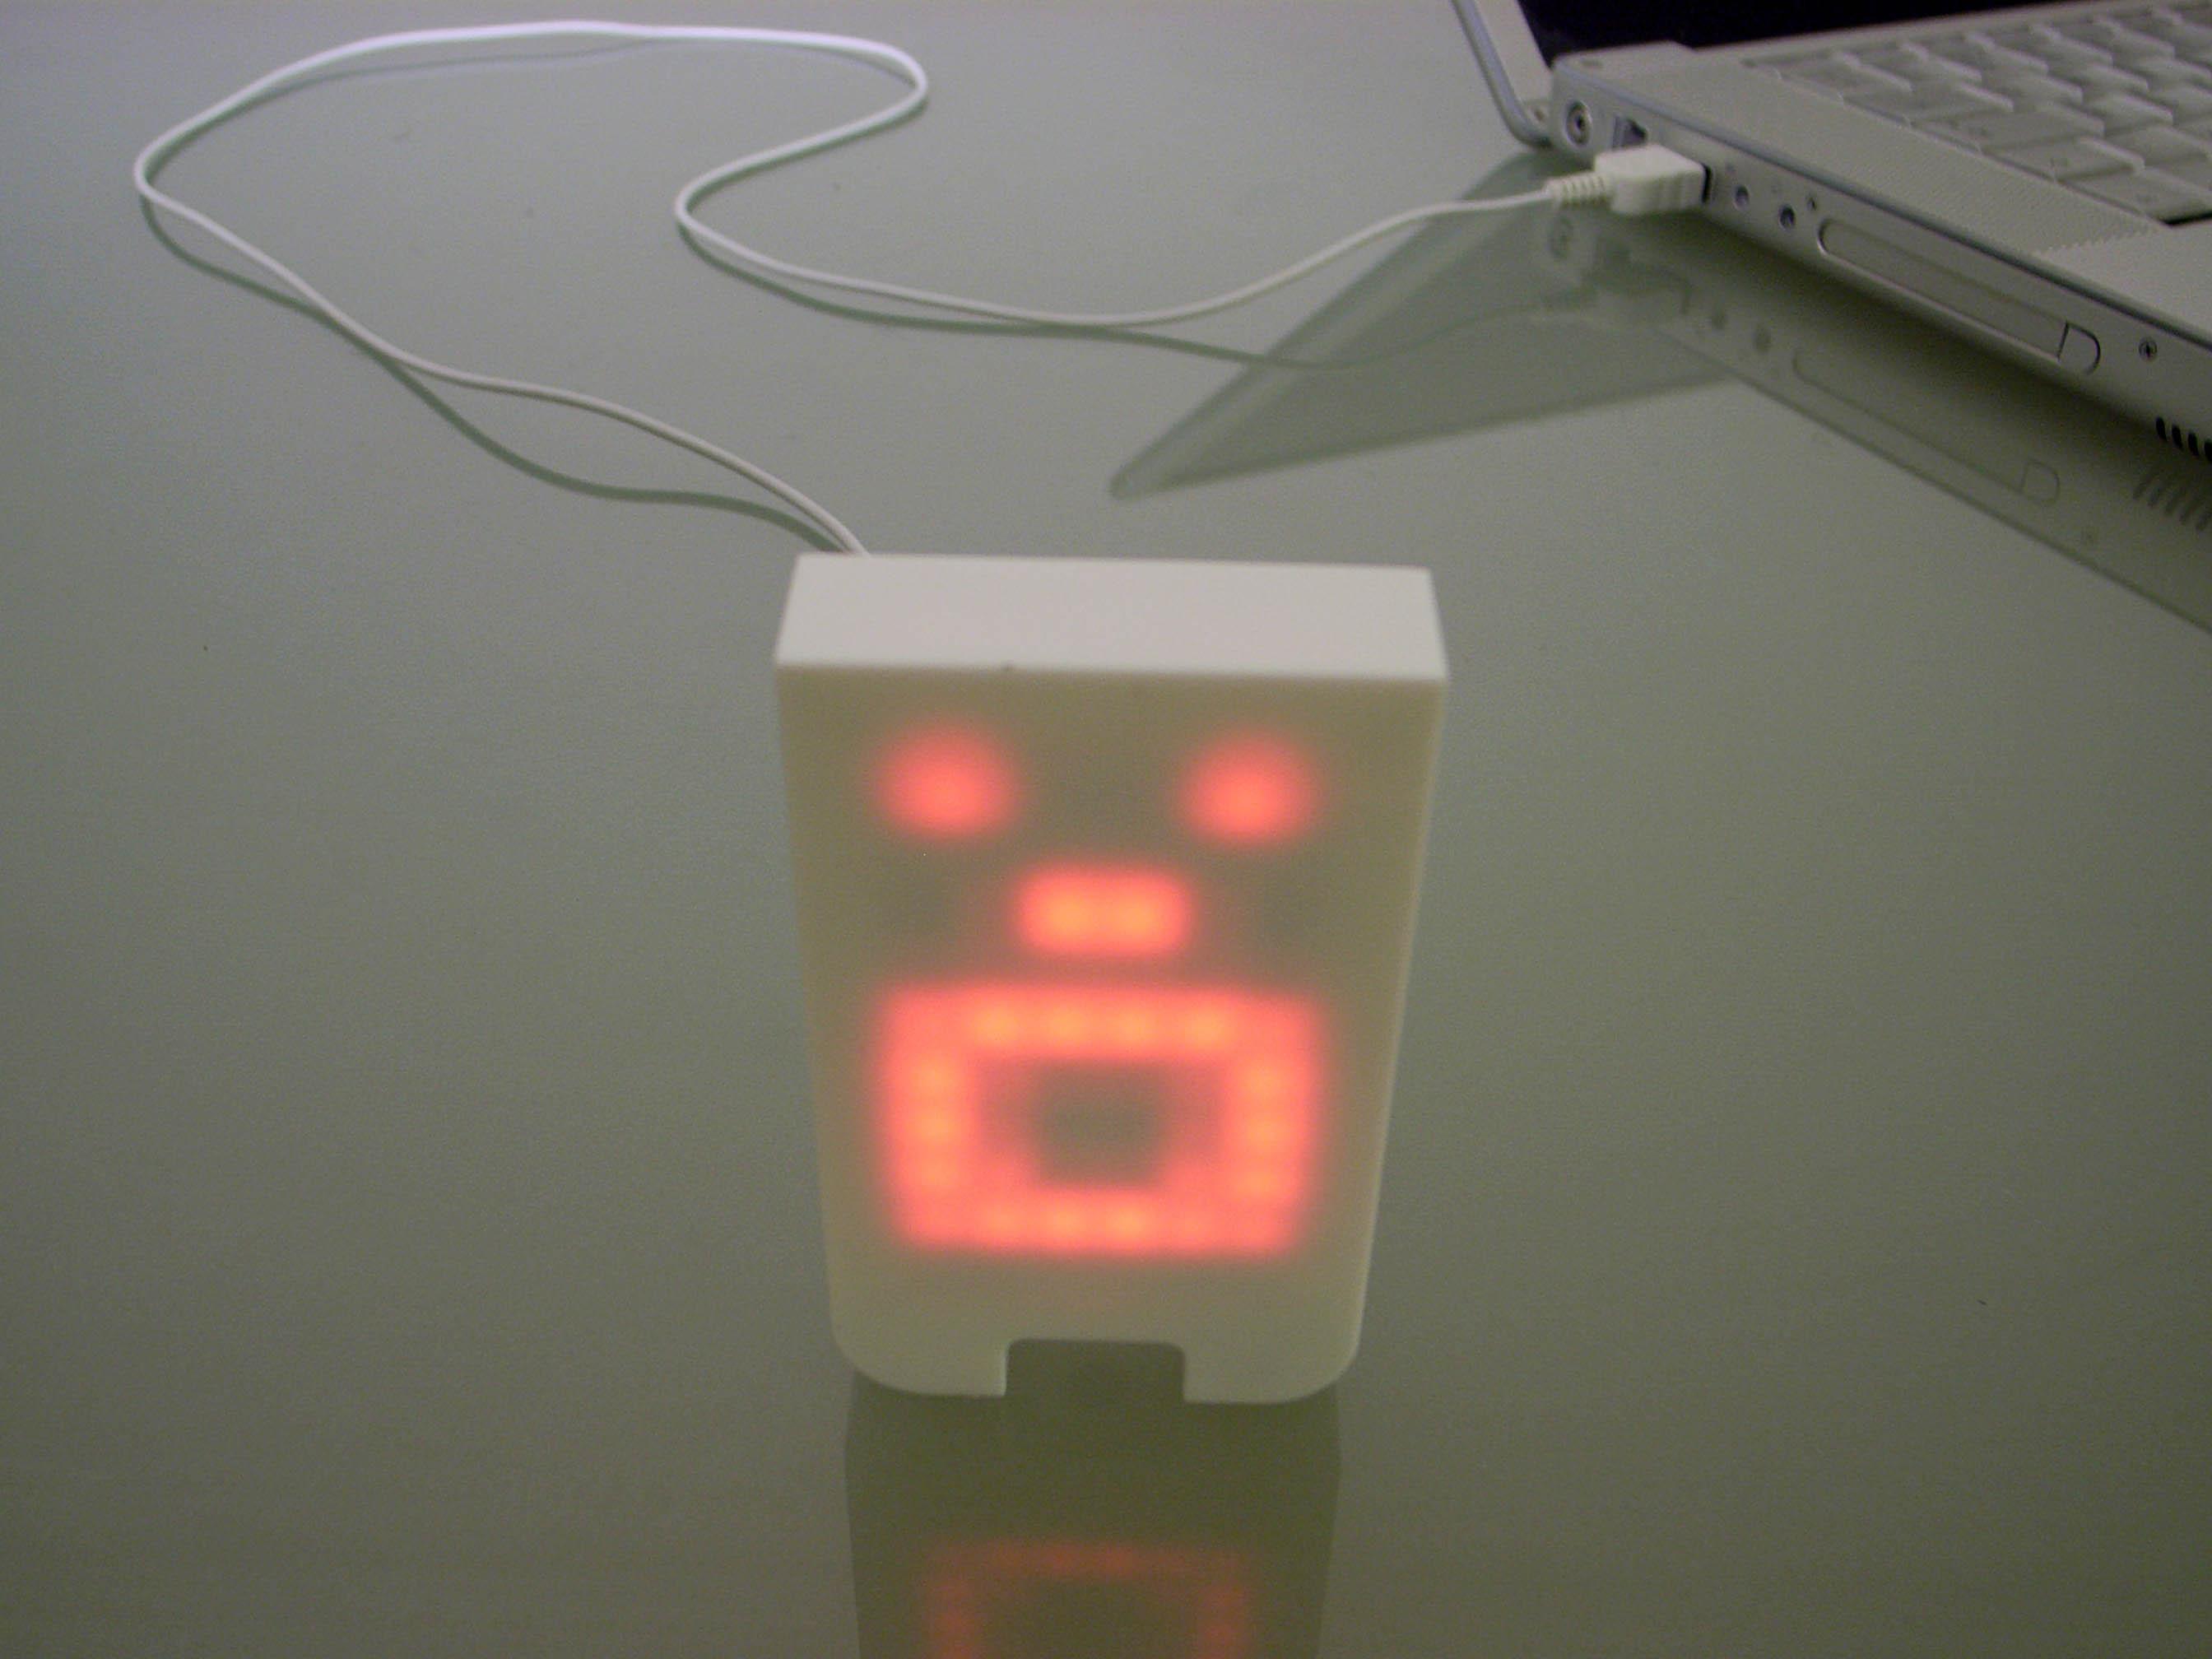 Mr. Tengu: Robot-like Desk Accessory Gets Moody